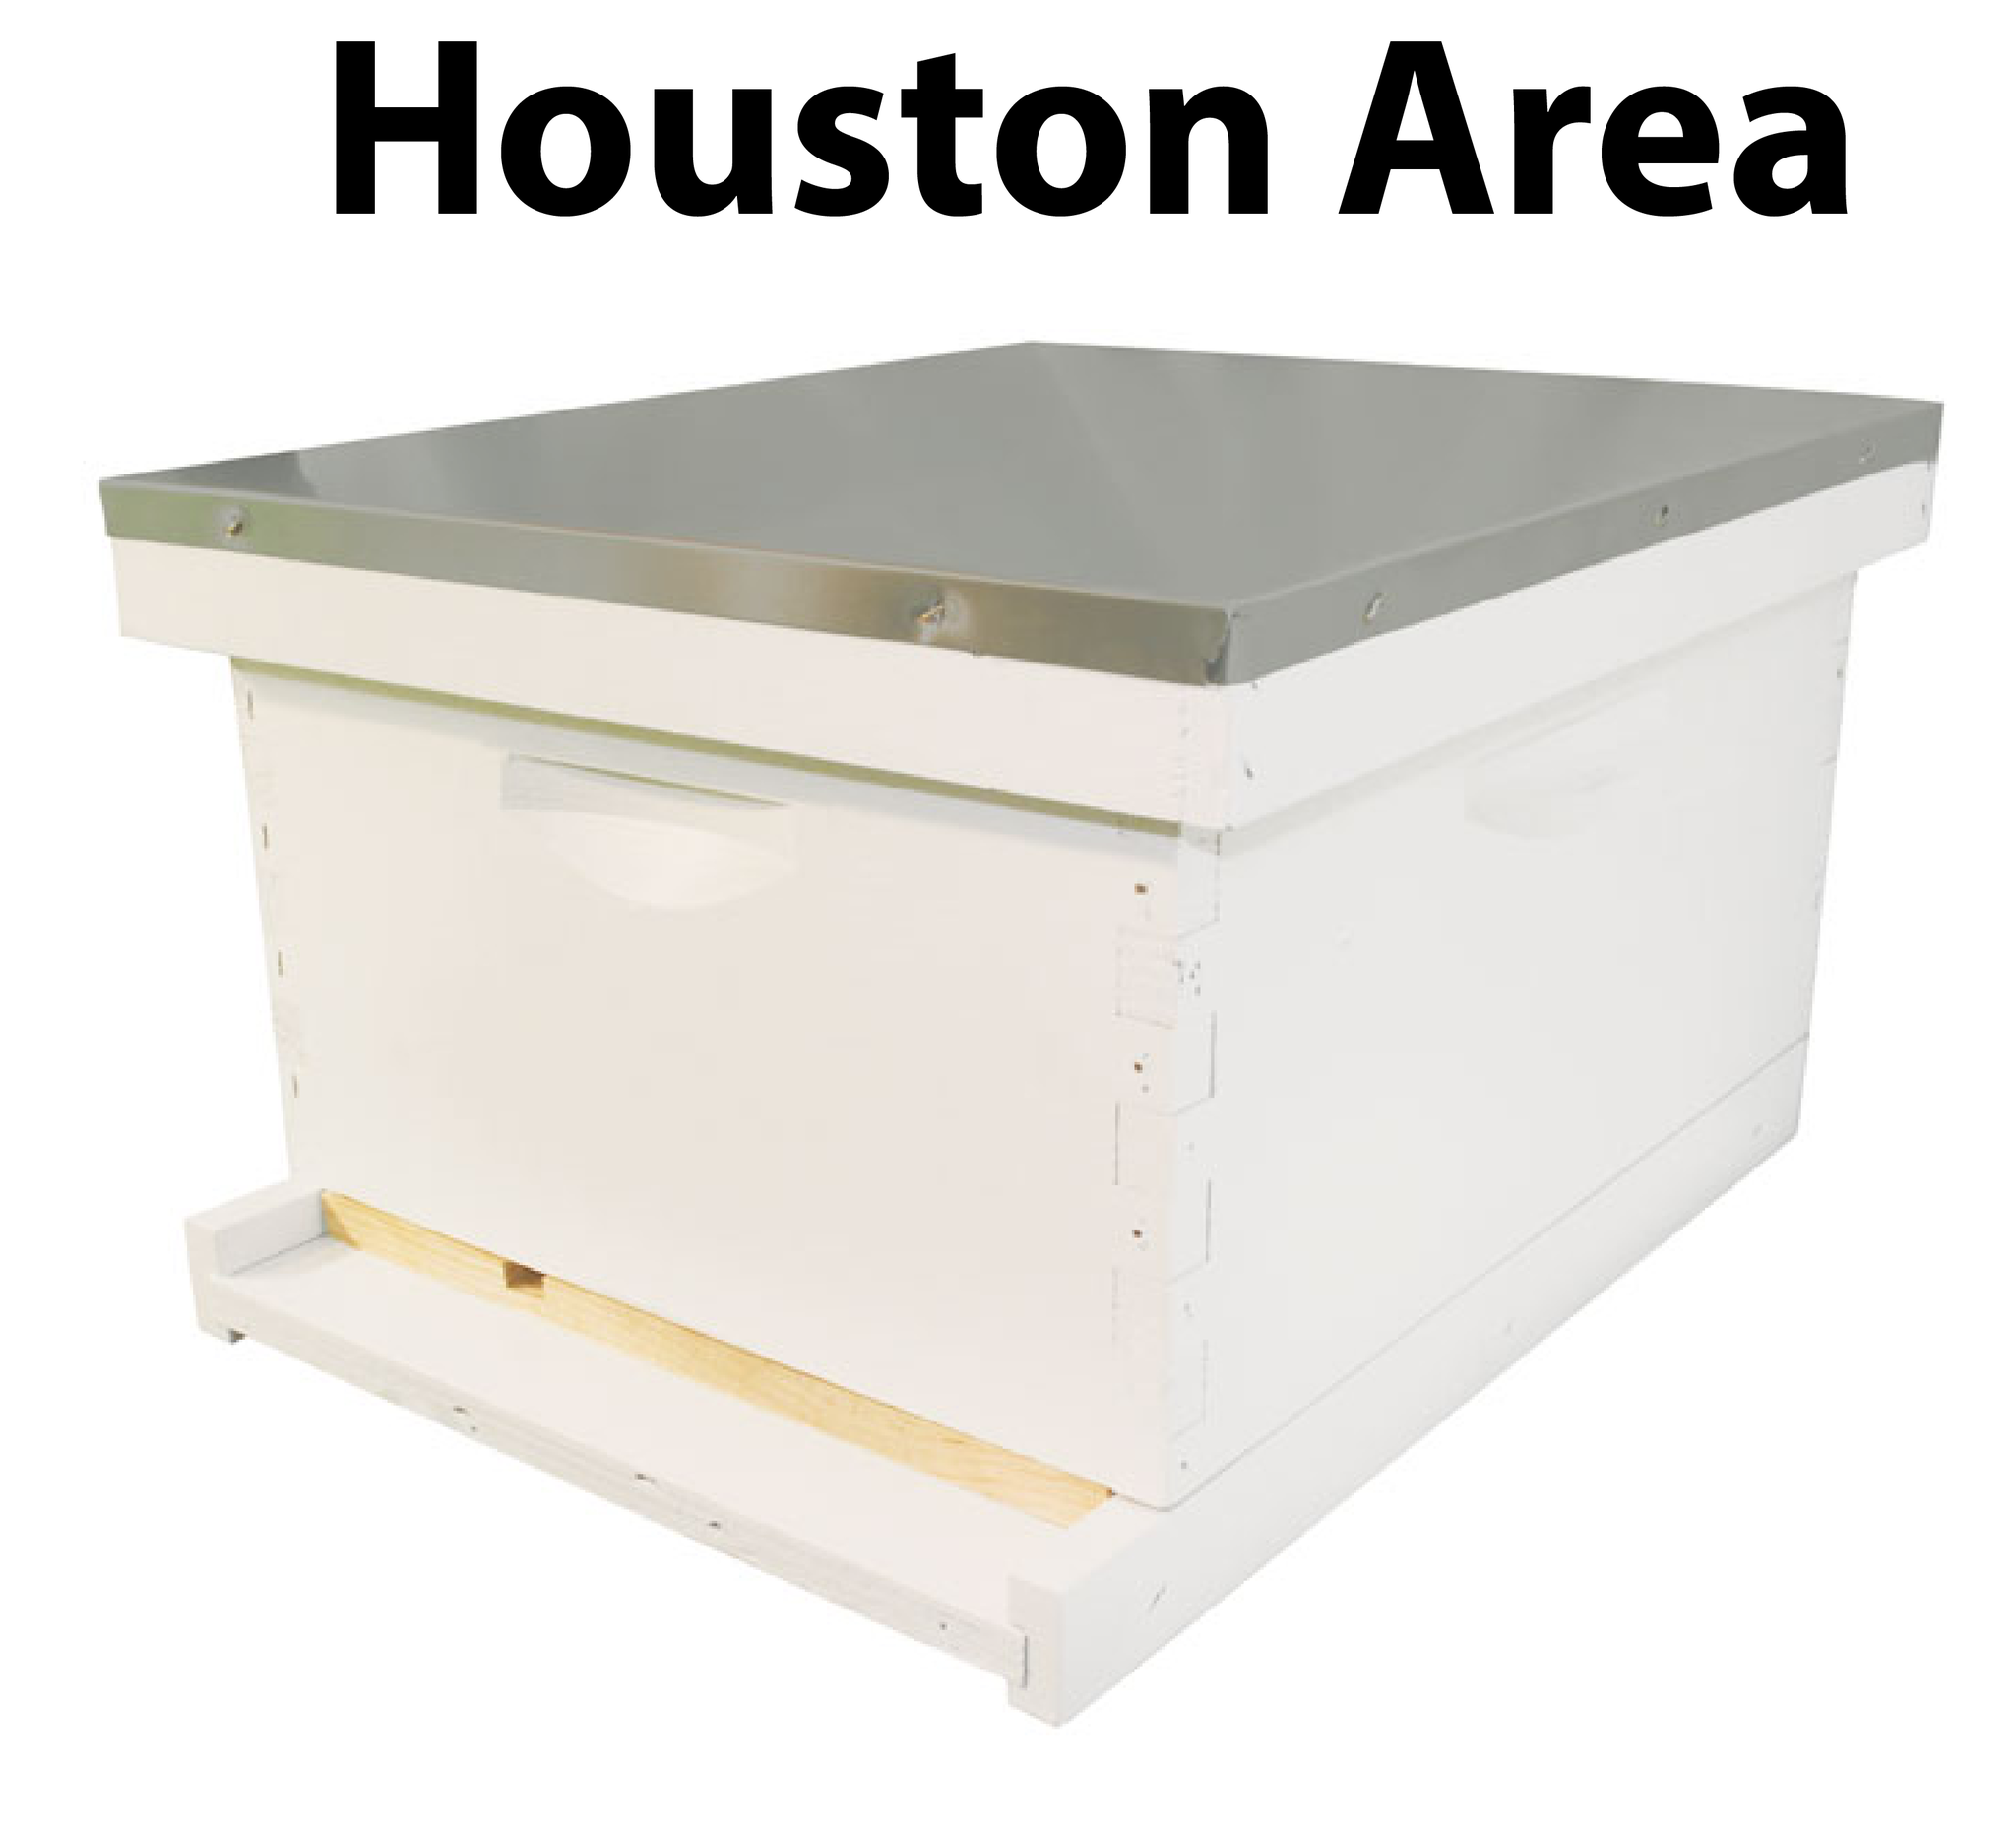 Texas 5000 Premium Single Story Hive - Dayton, TX